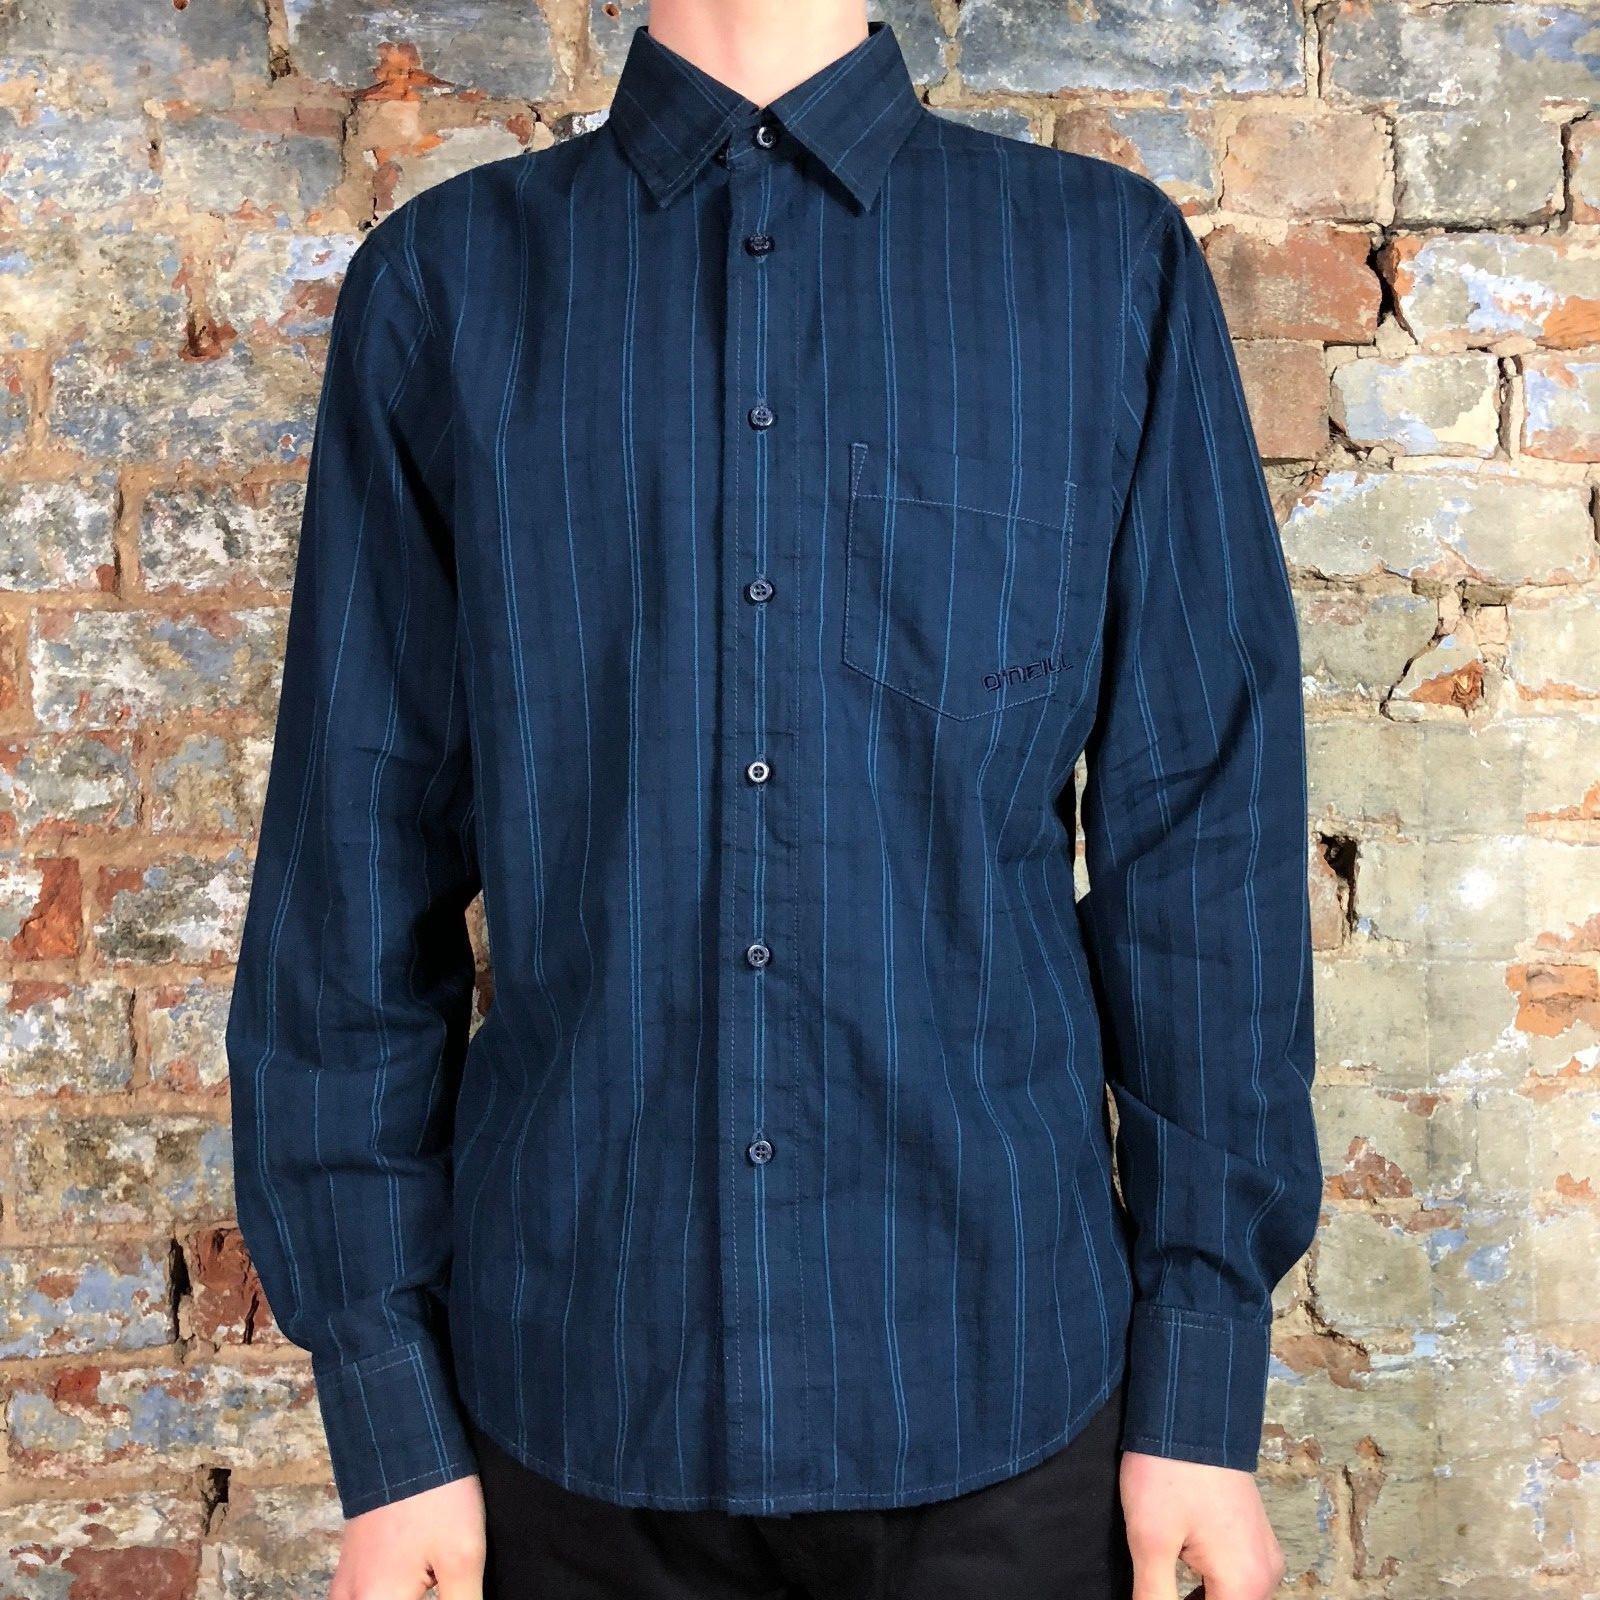 O'neill Casual Stripe Long Sleeve Shirt New - bluee - Size  S